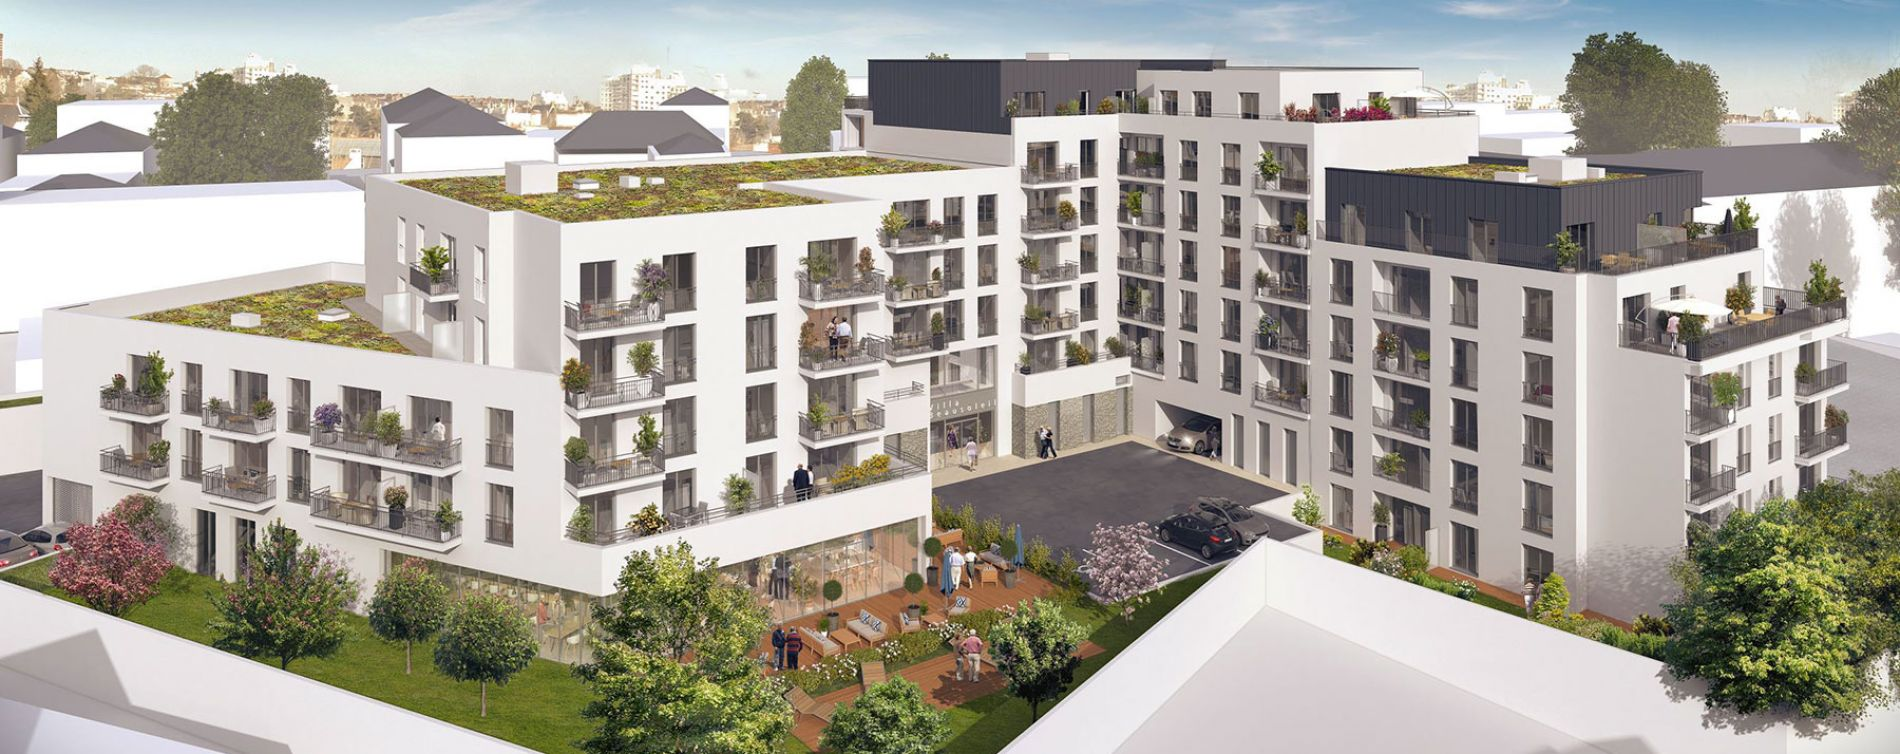 Brest : programme immobilier neuve « Villa Beausoleil » (3)